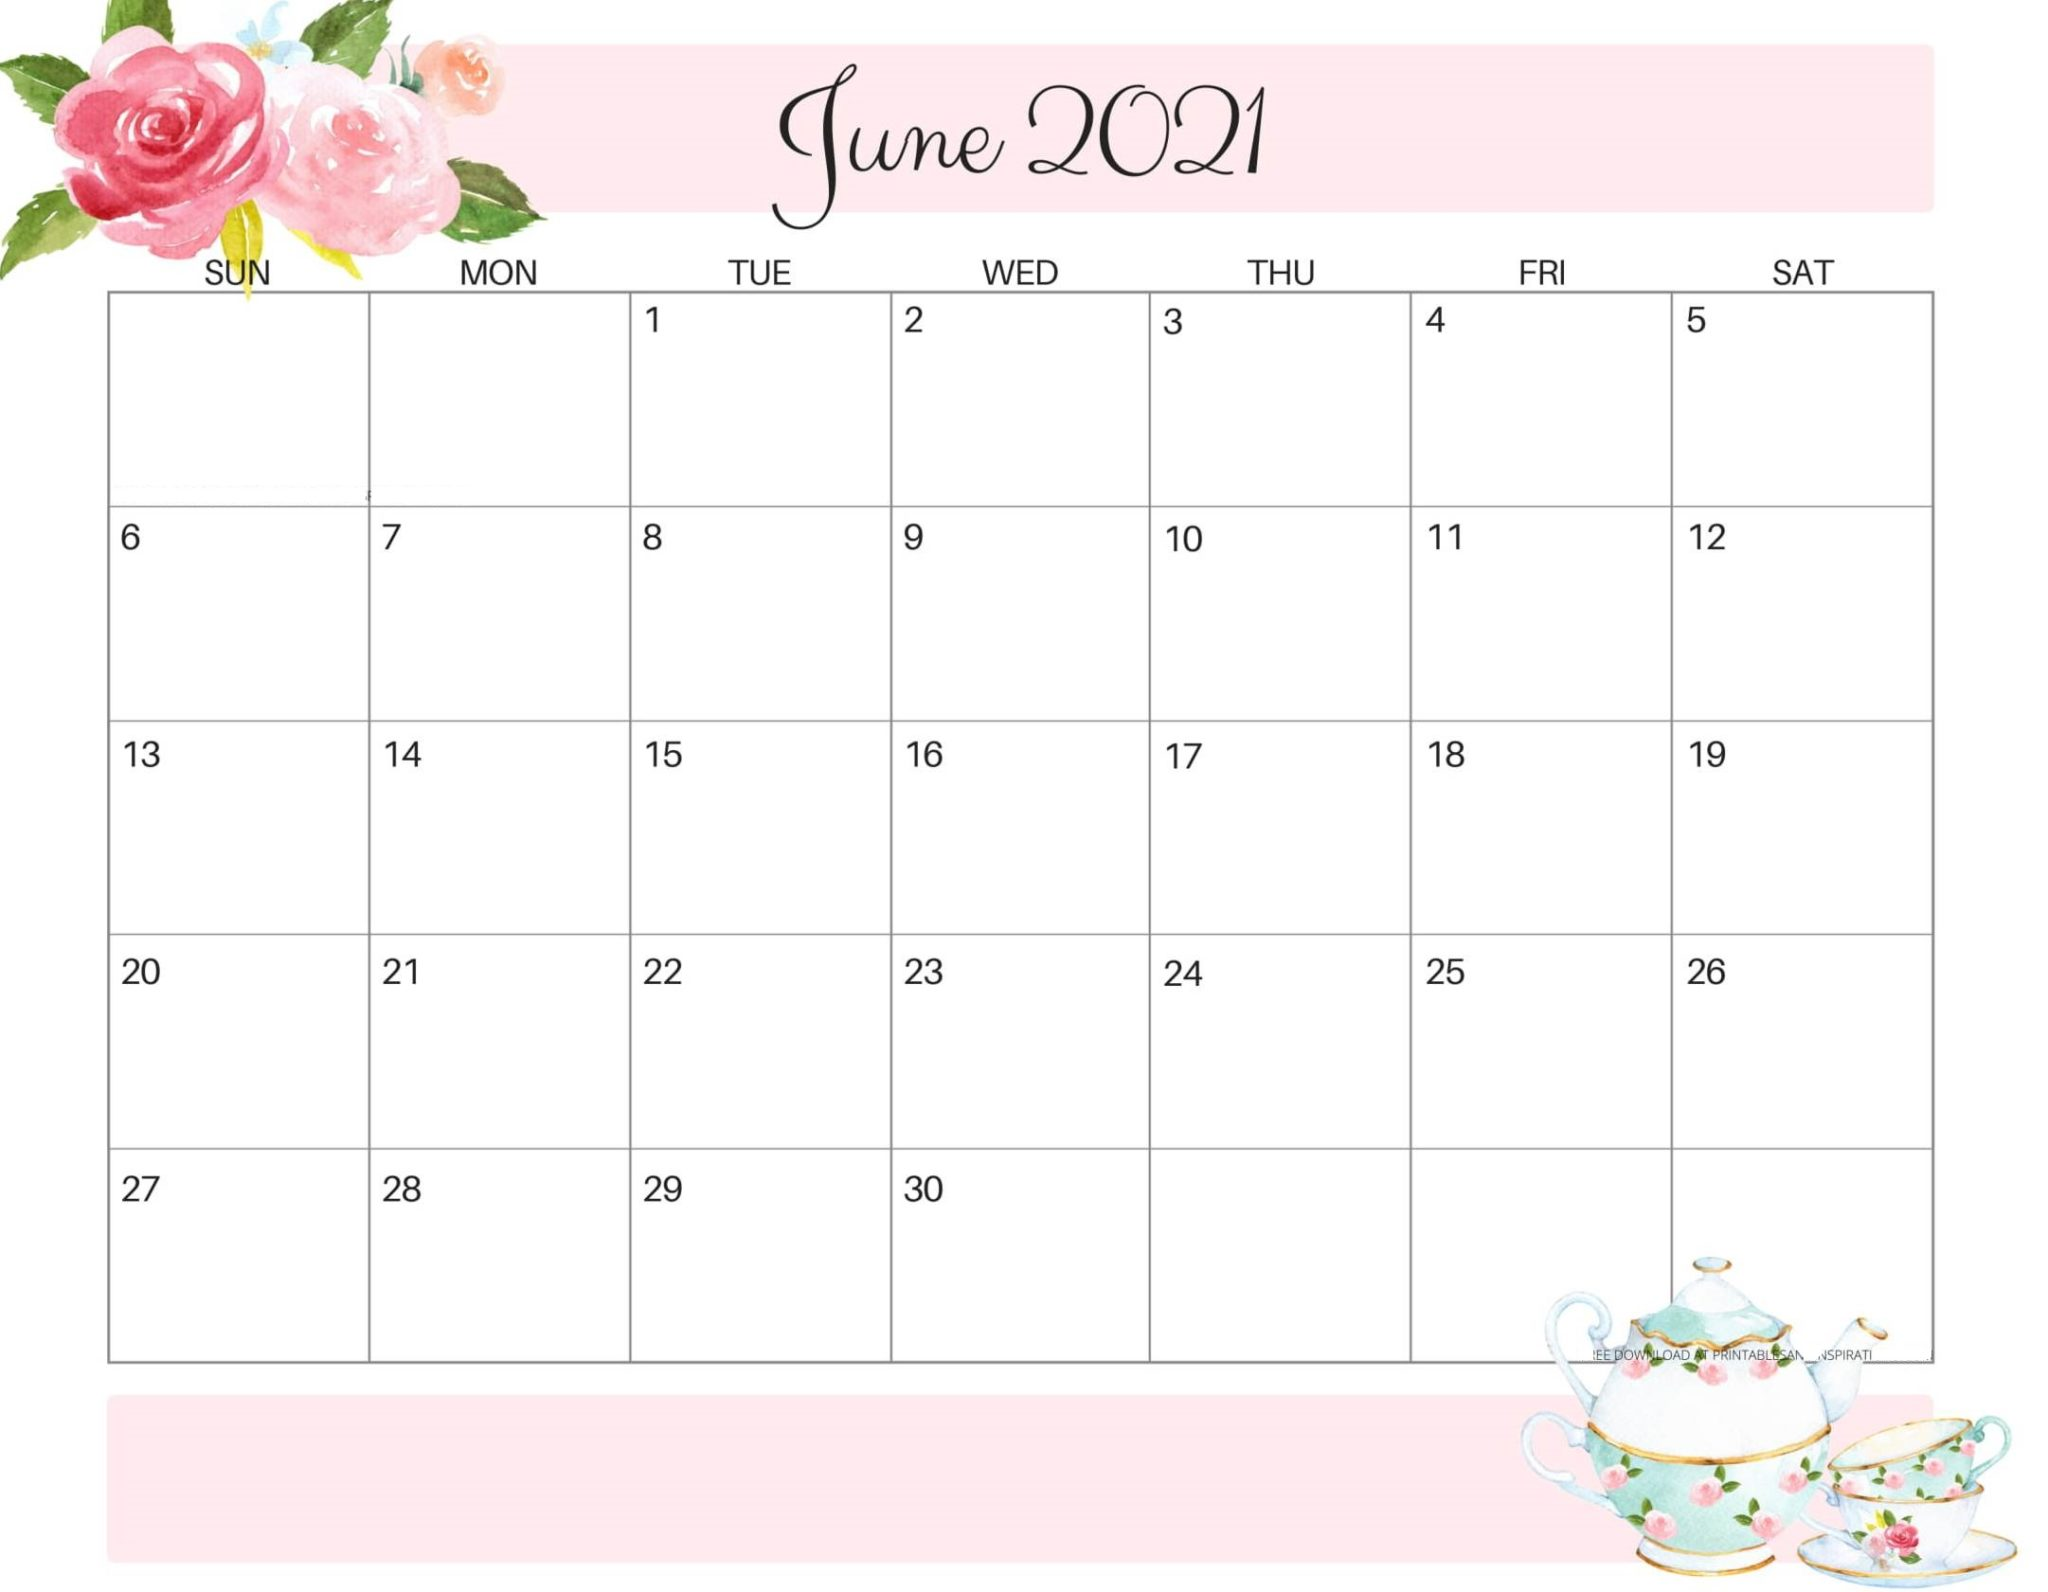 Cute June 2021 Calendar Colorful Design Images for iphone